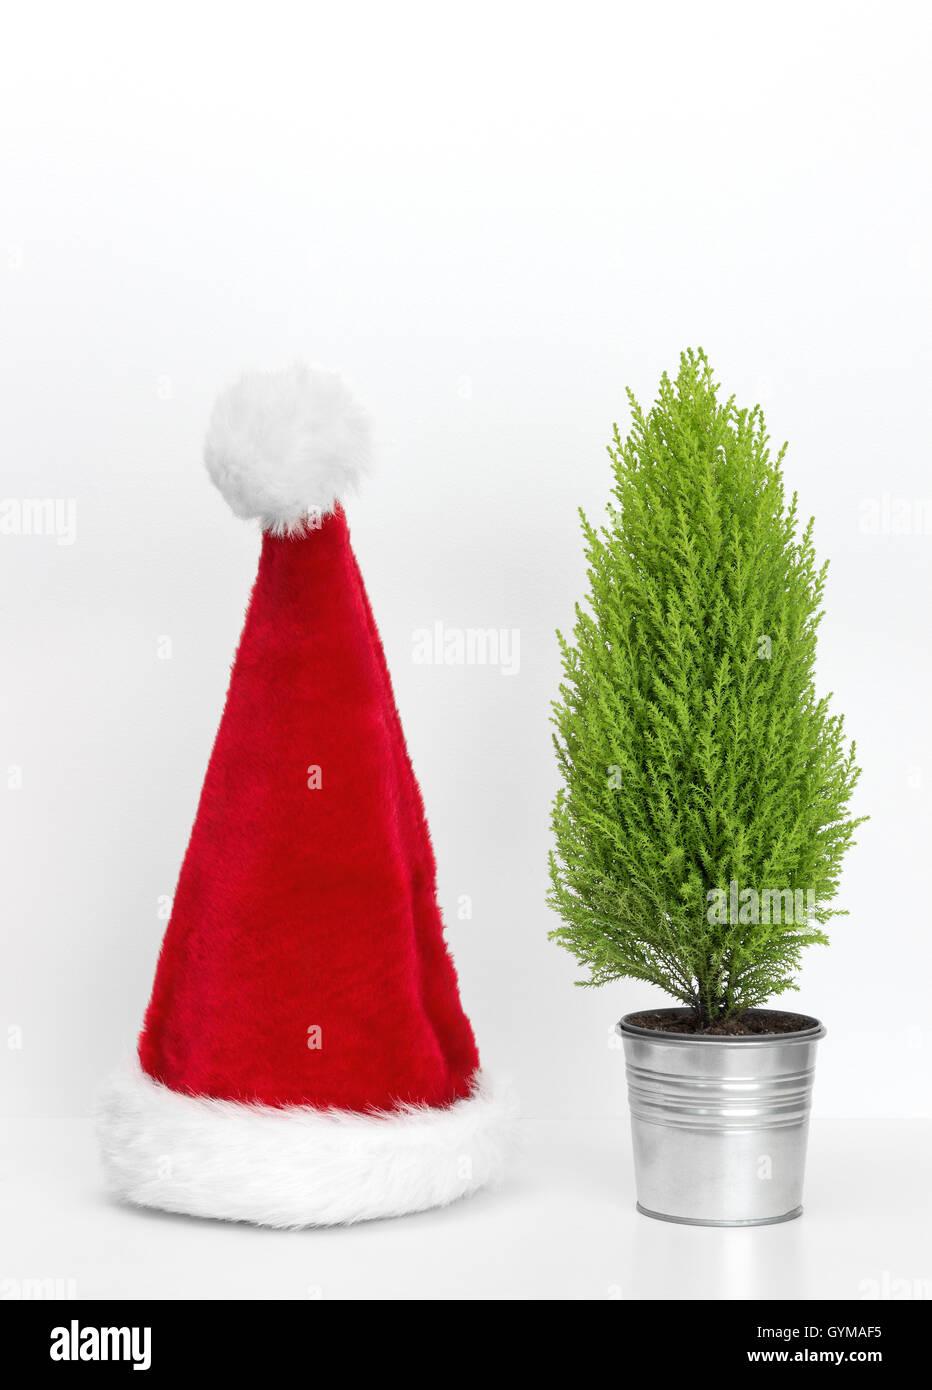 Santa Hat And Little Christmas Tree Stock Photo 120305225 Alamy